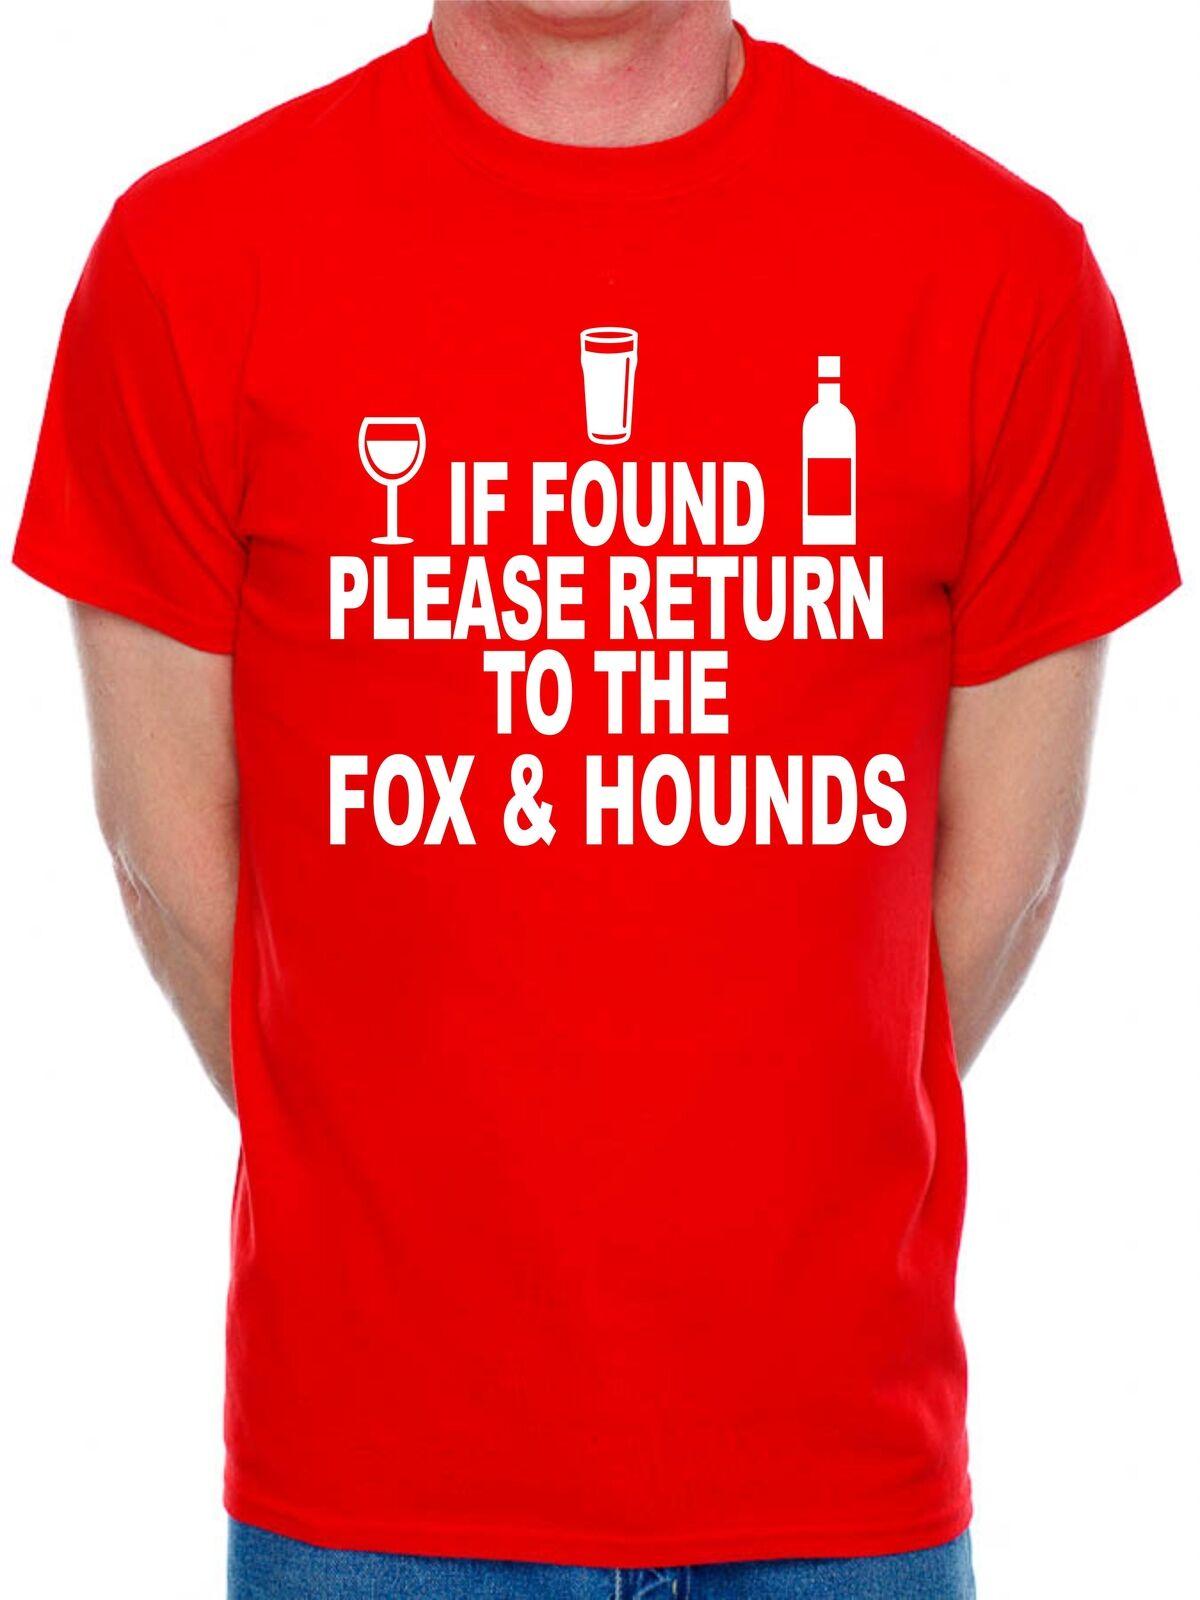 Camiseta personalizada para hombre si encuentra el retorno a Fox Hounds Pub elija su nombre de Pub